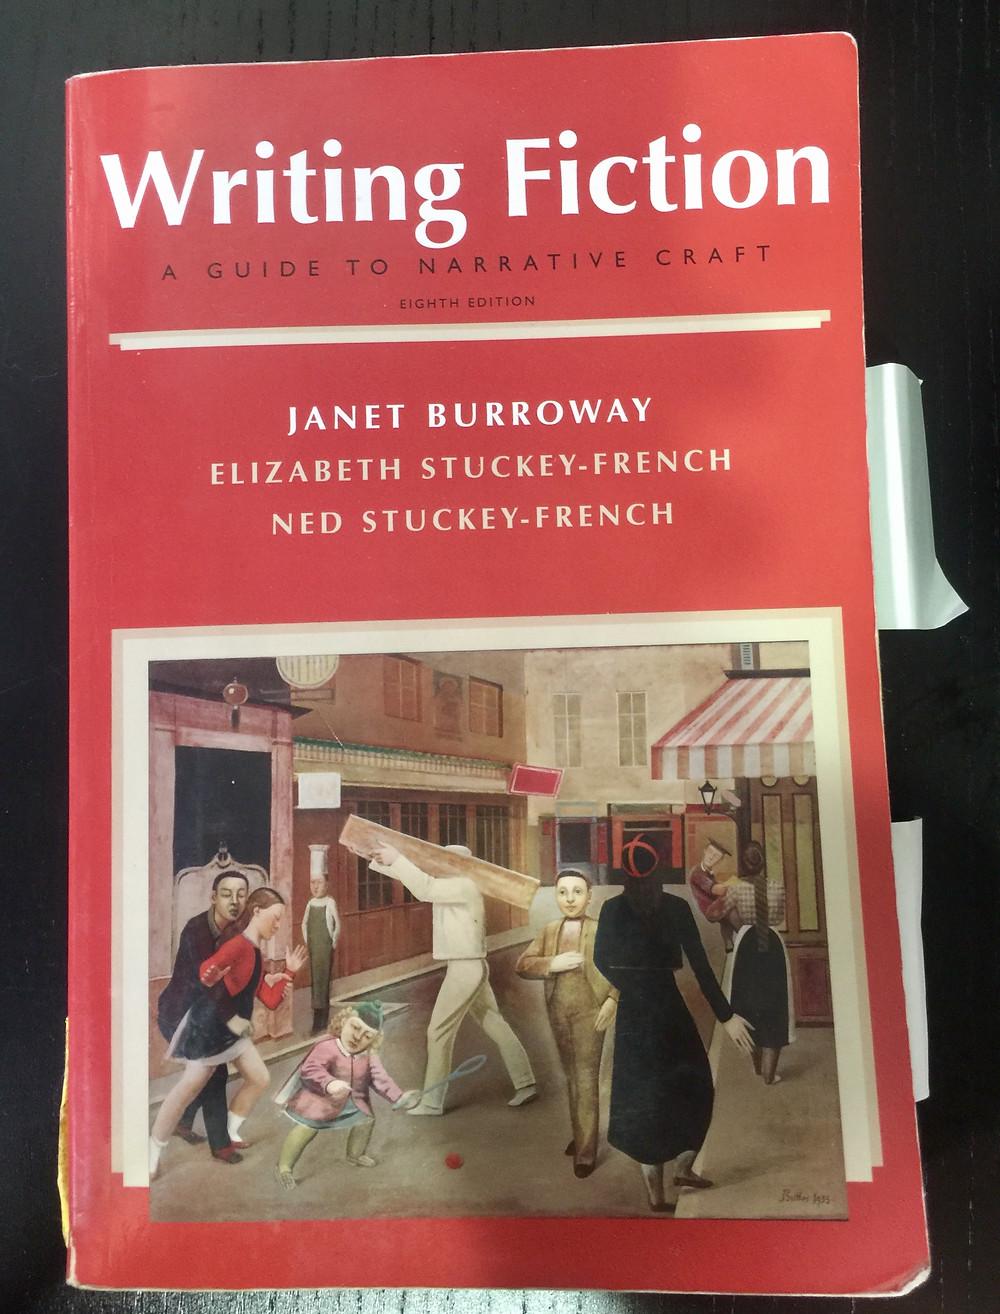 Writing Fiction, guidebook, Janet Burroway, narrative craft